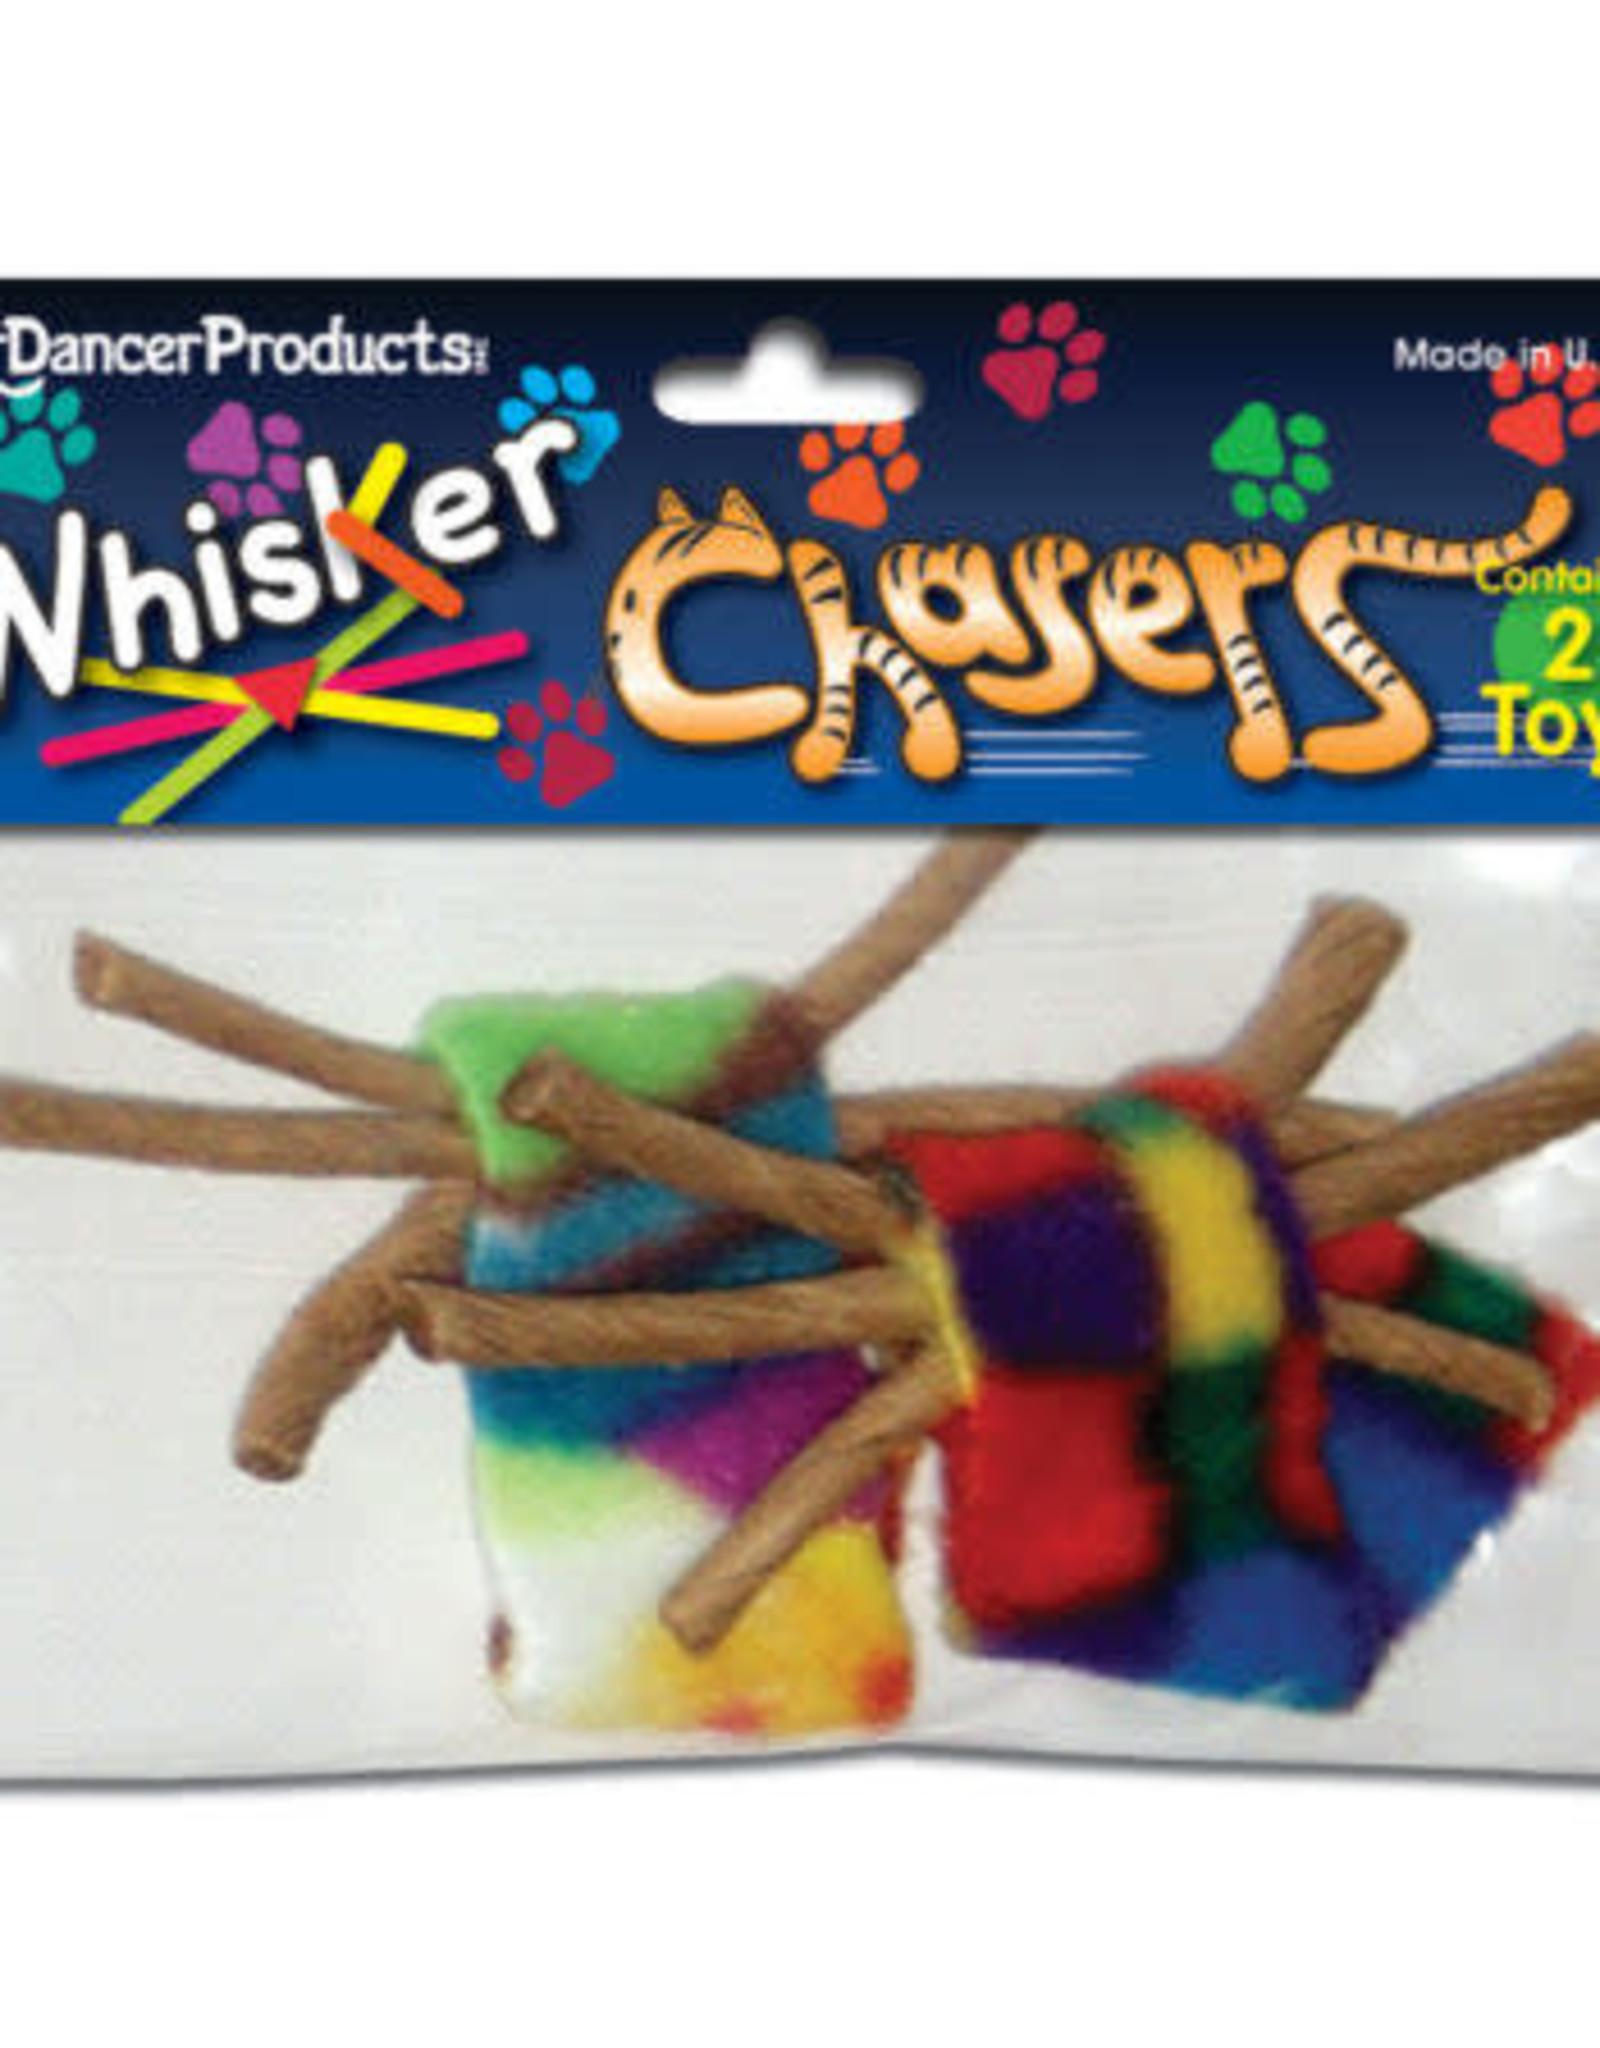 CatDancer Cat Dancer Whisker Chaser 2pk